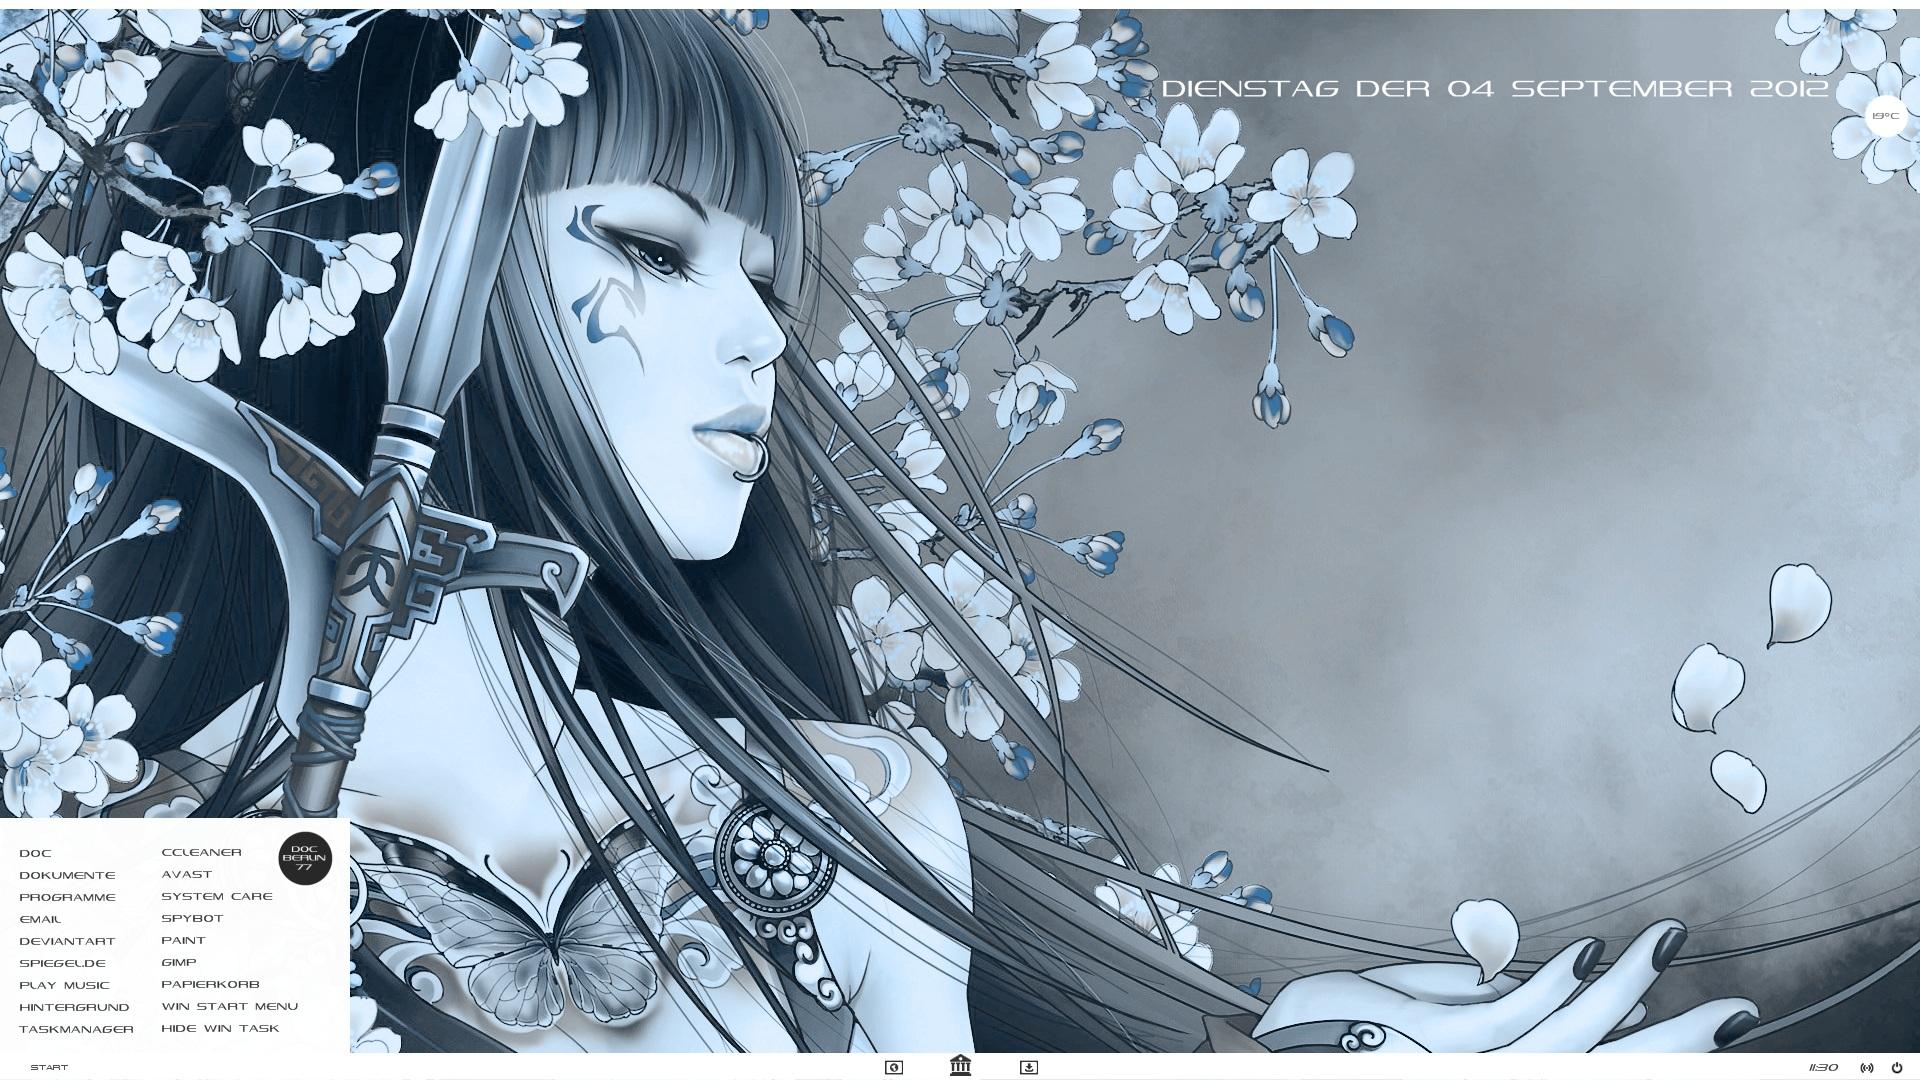 Beautiful Warrior  04.09.2012 by DocBerlin77